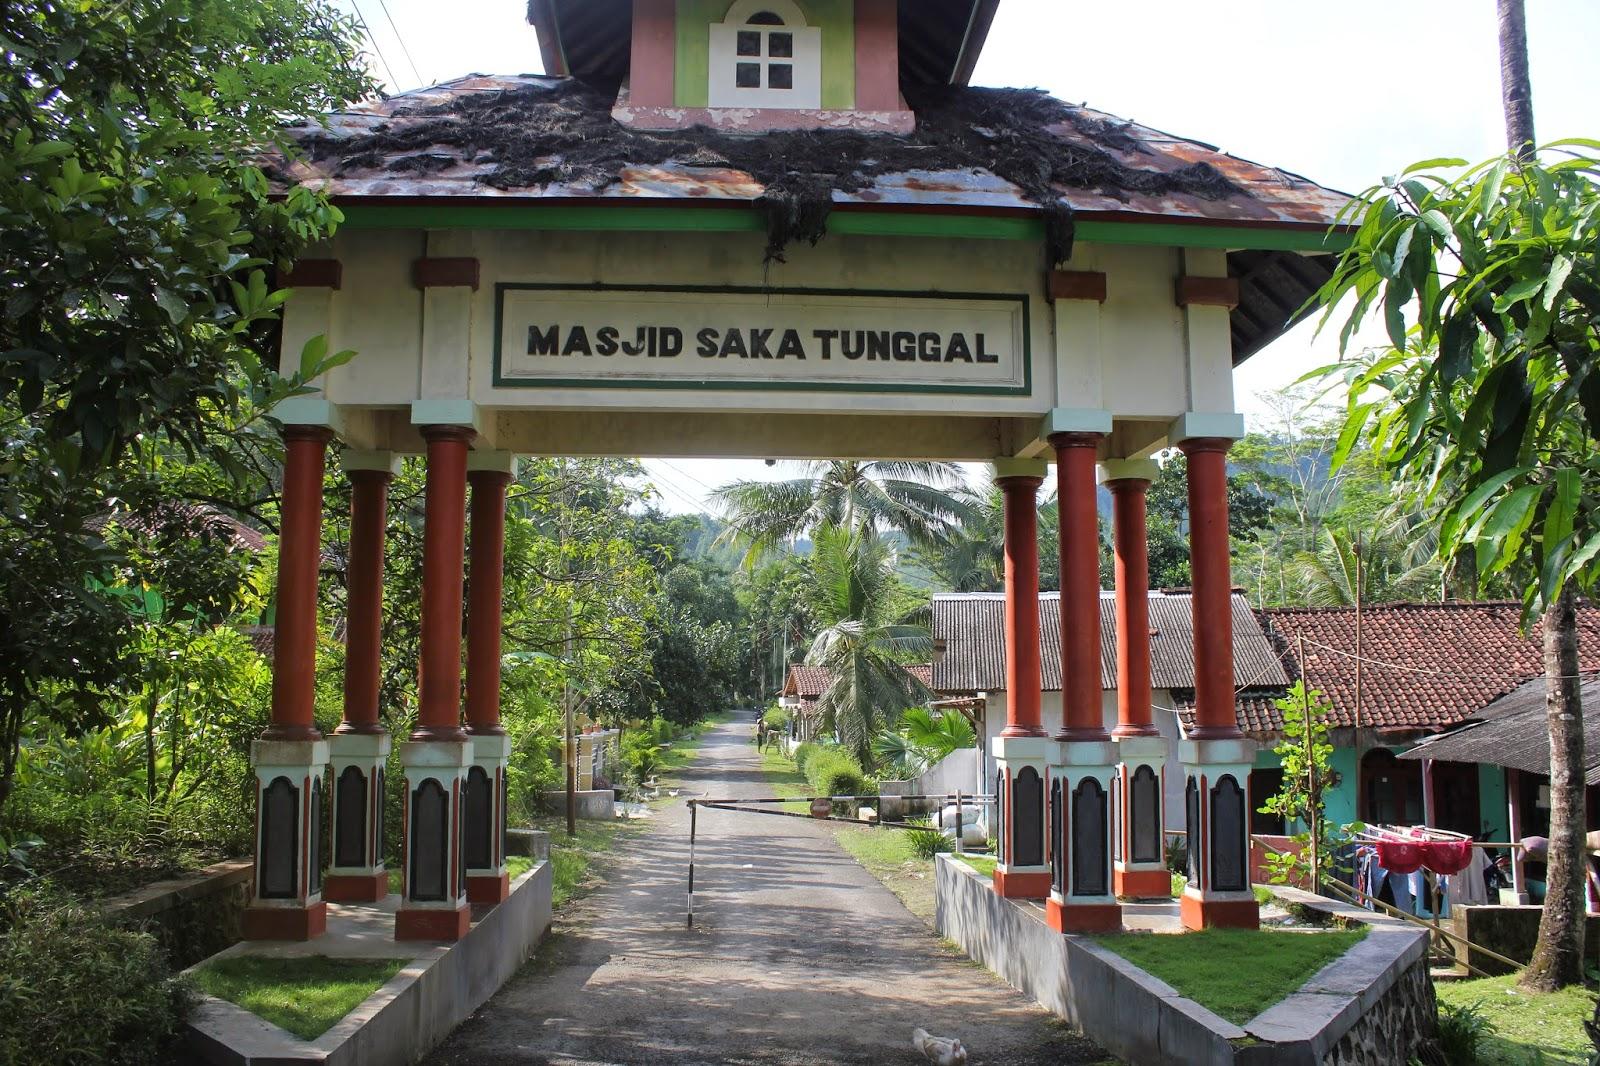 Sejarah Masjid Saka Tunggal Baitussalam Banyumas Kab